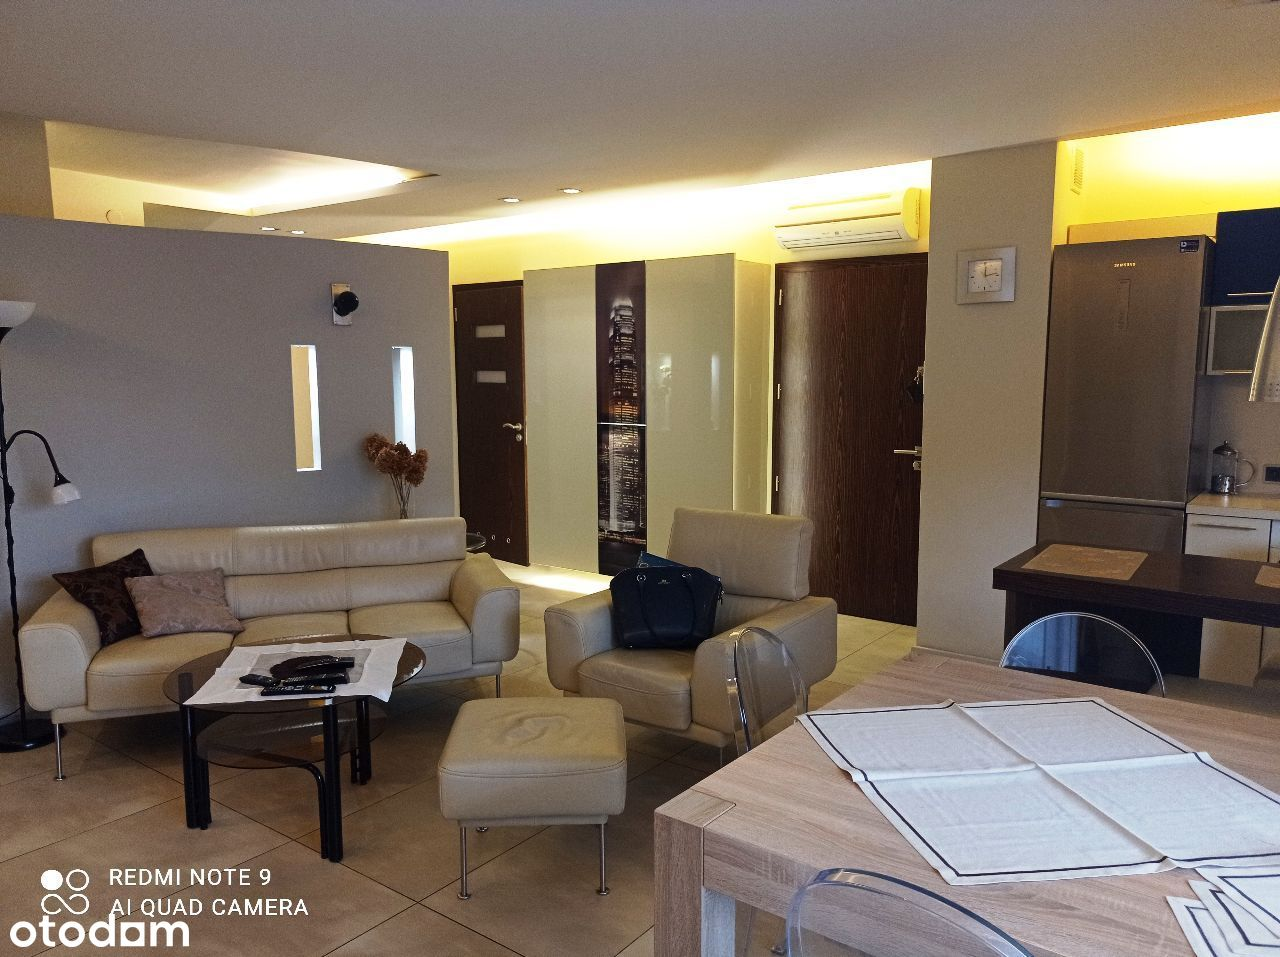 Apartament komfort Cegielniana bez pośredników